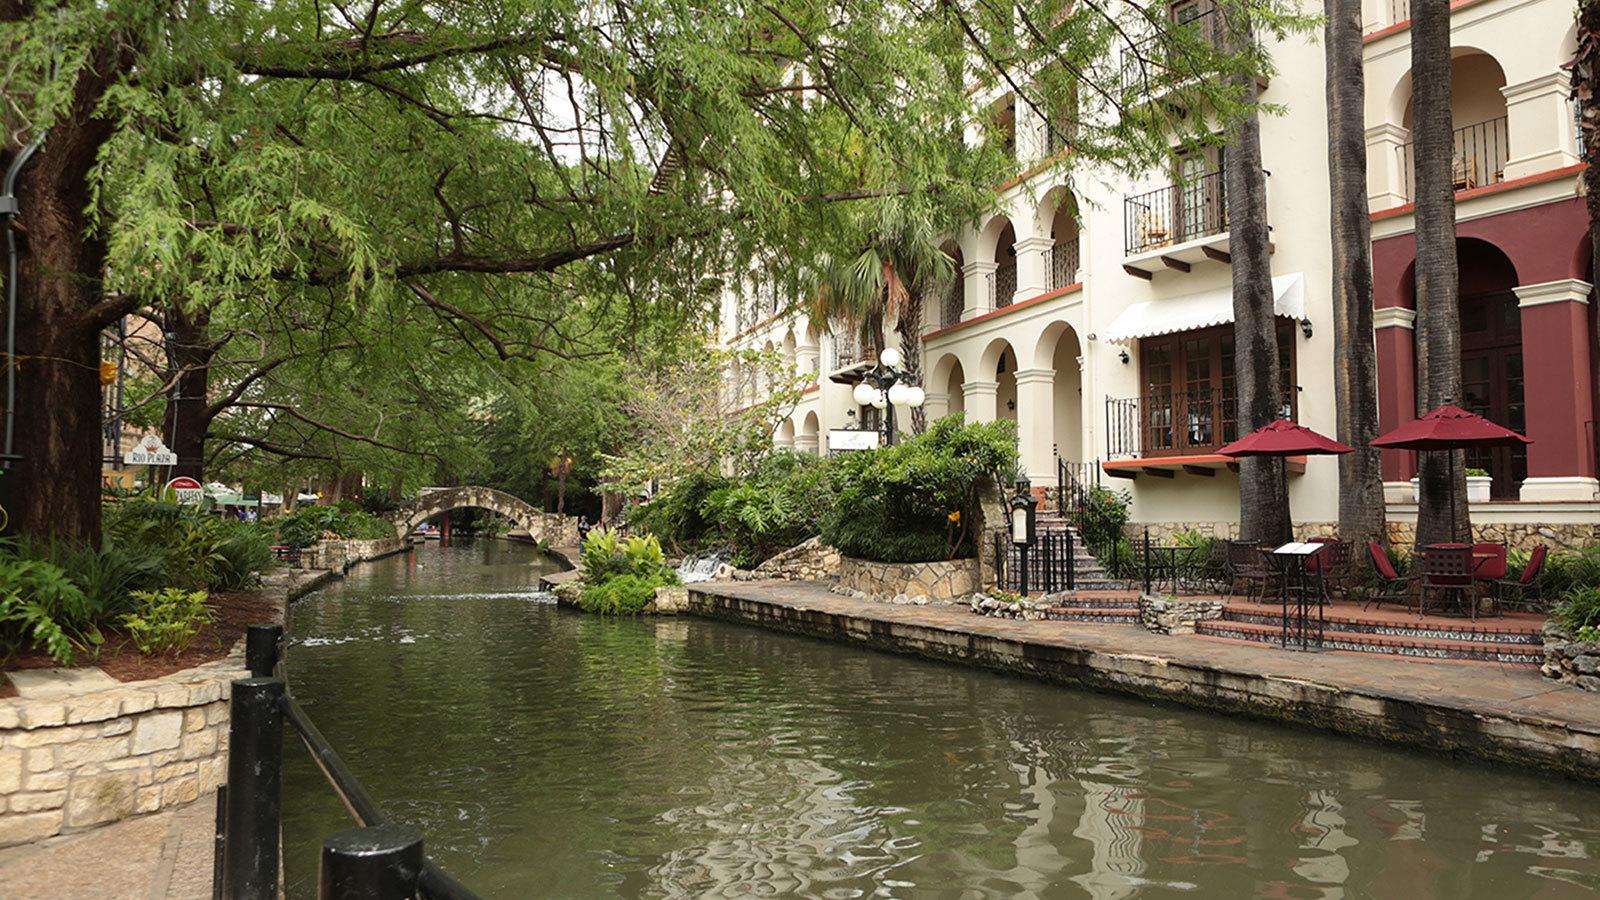 san antonio river walk wttw chicago public media